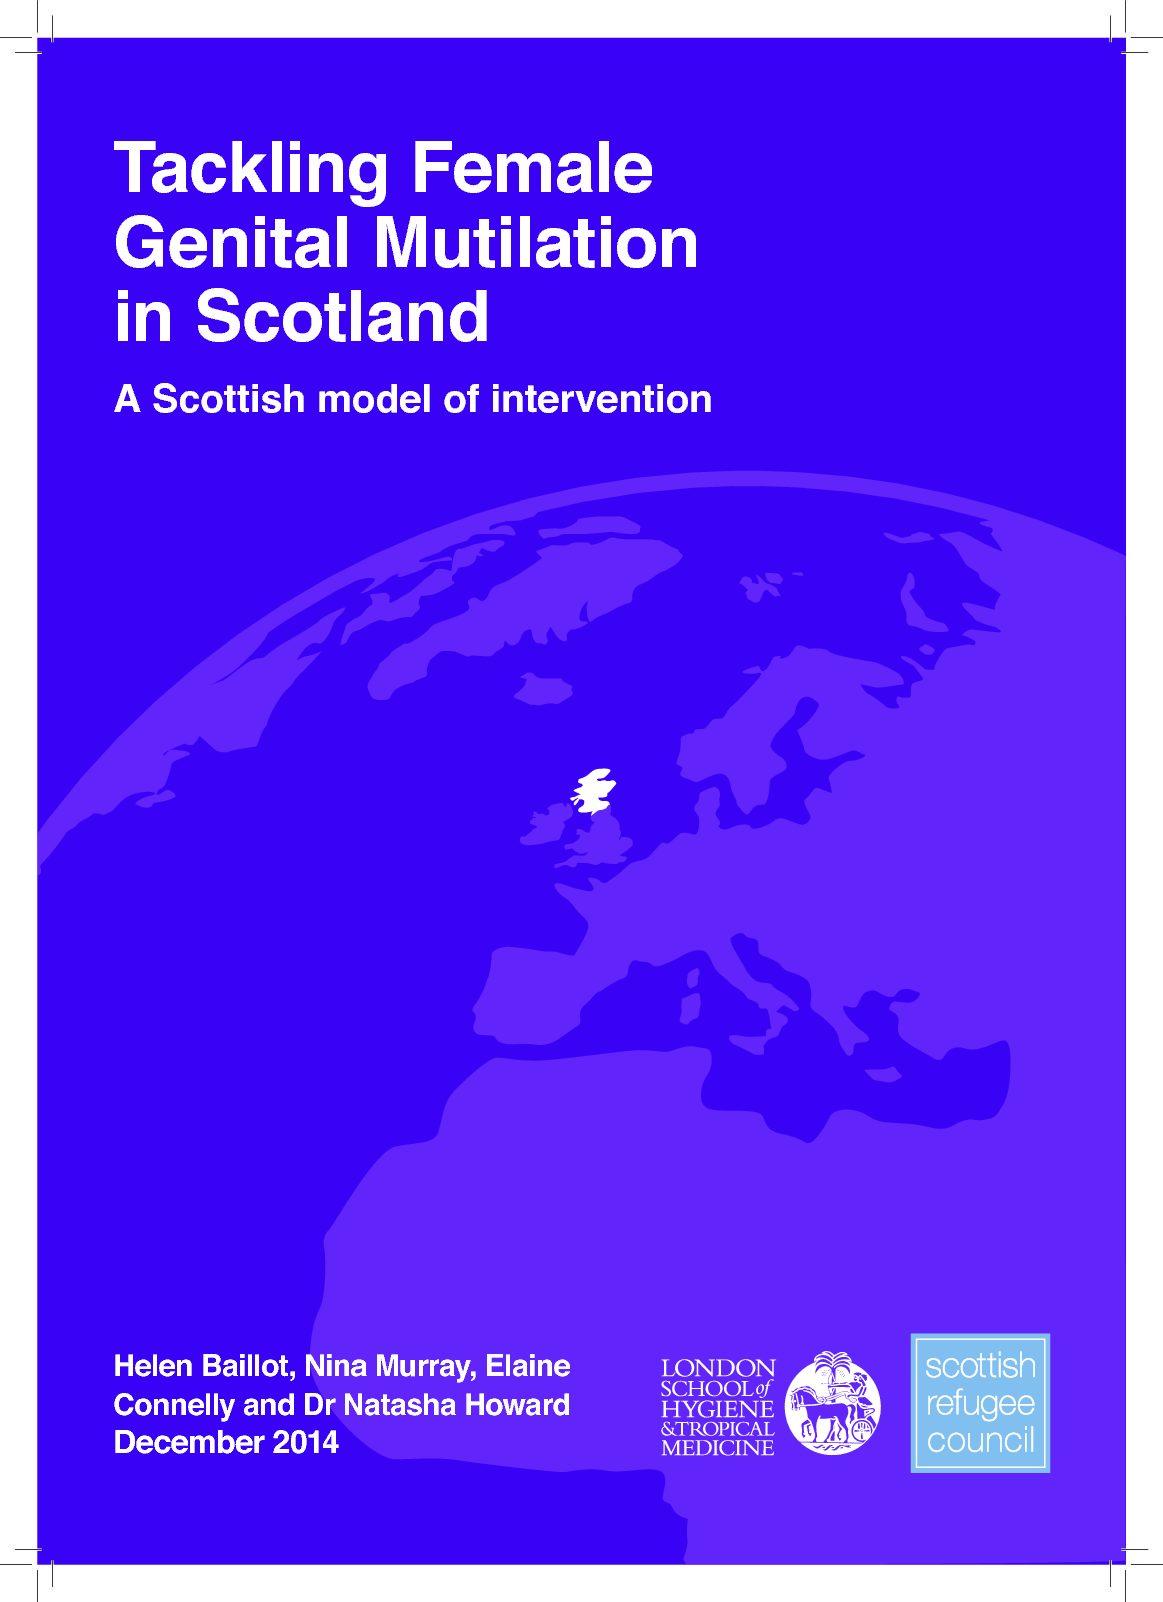 Tackling-Female-Genital-Mutilation-in-Scotland-A-Scottish-model-of-intervention-pdf